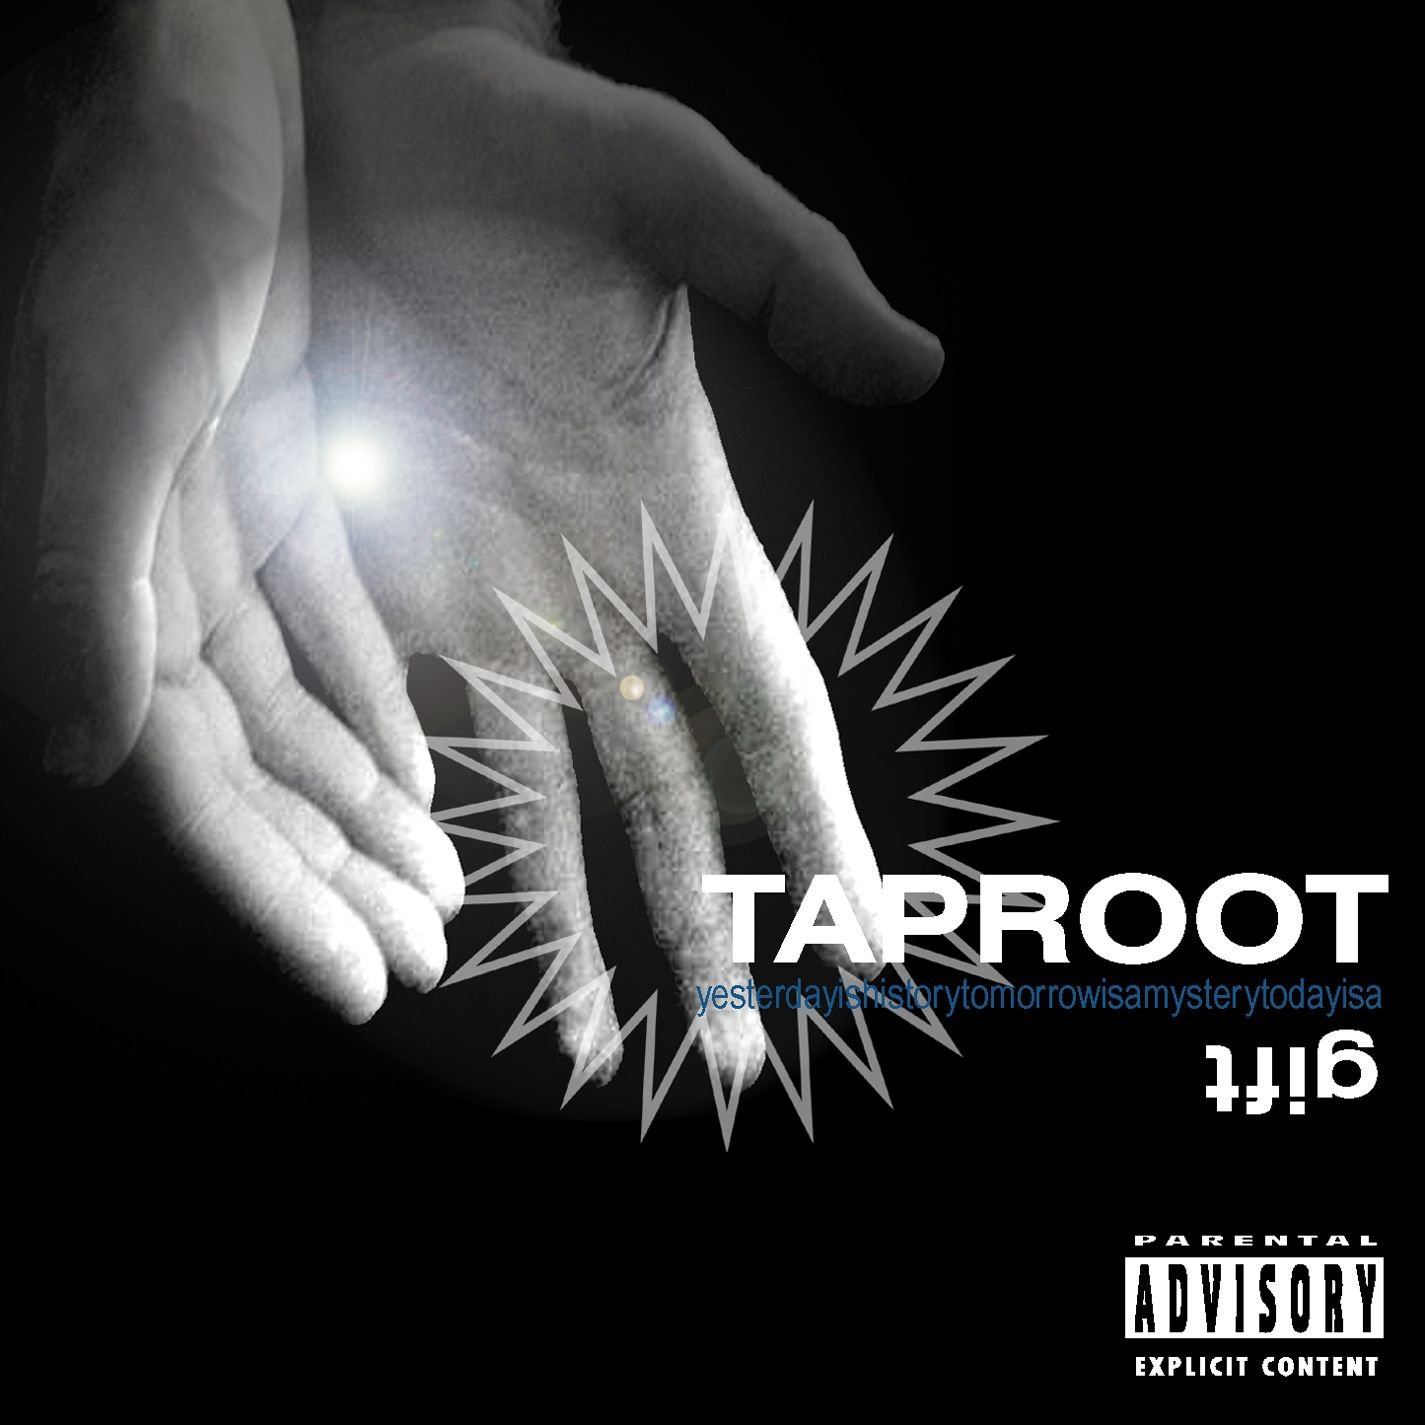 Taproot - Gift - Amazon.com Music